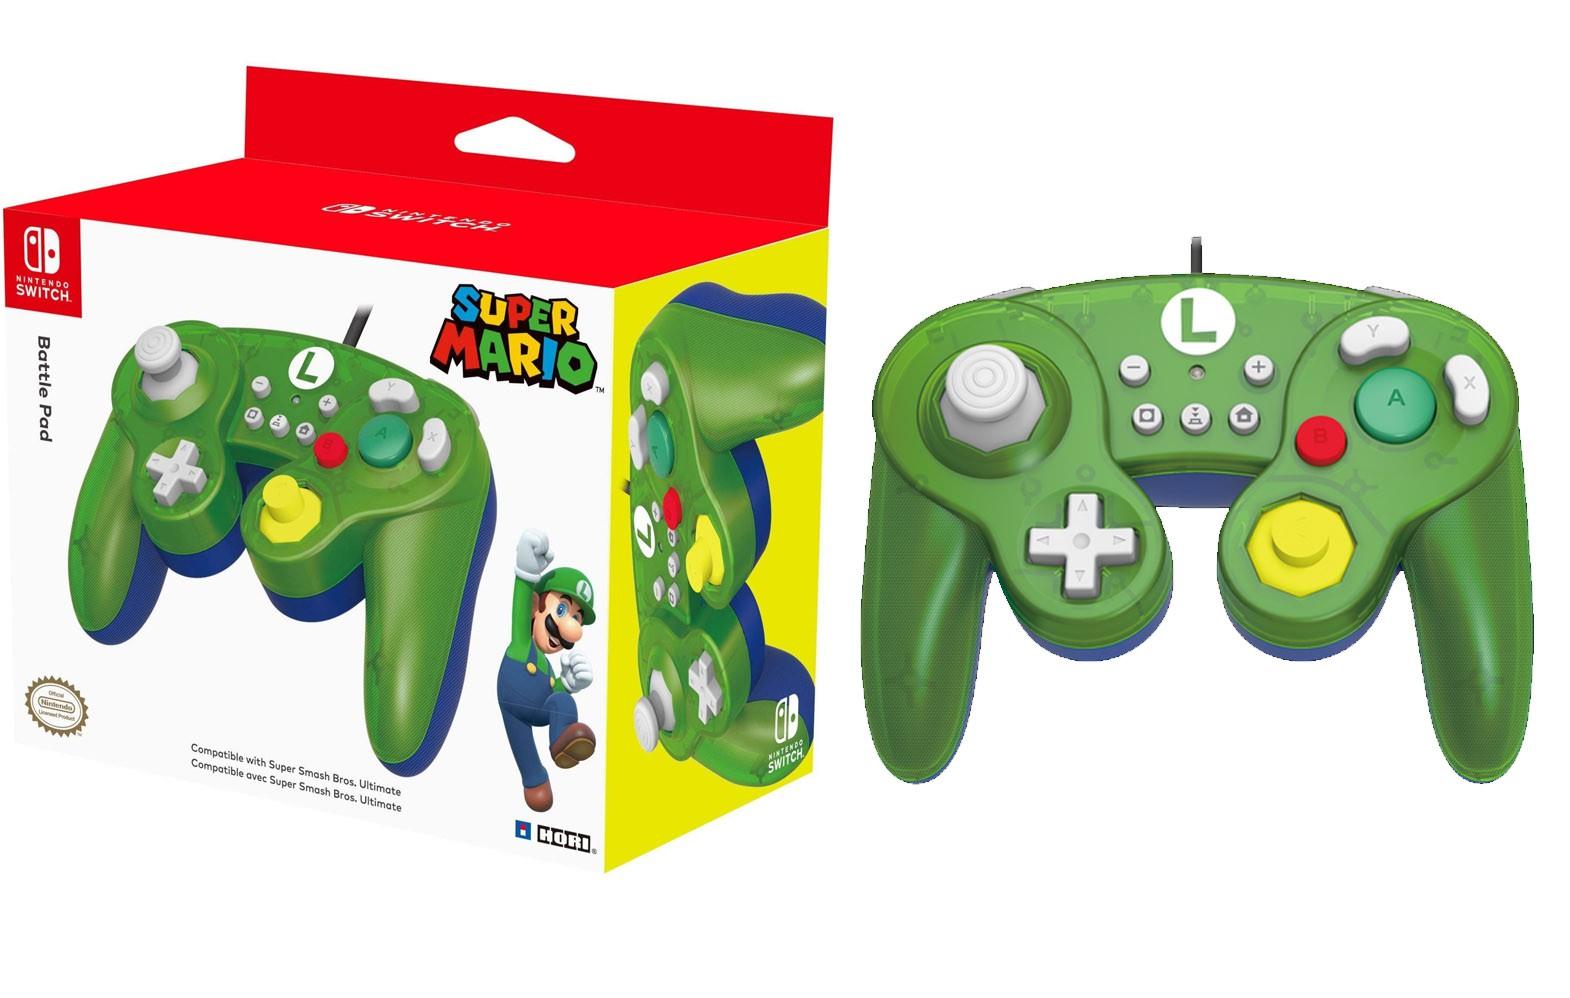 HORI Nintendo Switch Battle Pad (Luigi) GameCube Style Controller